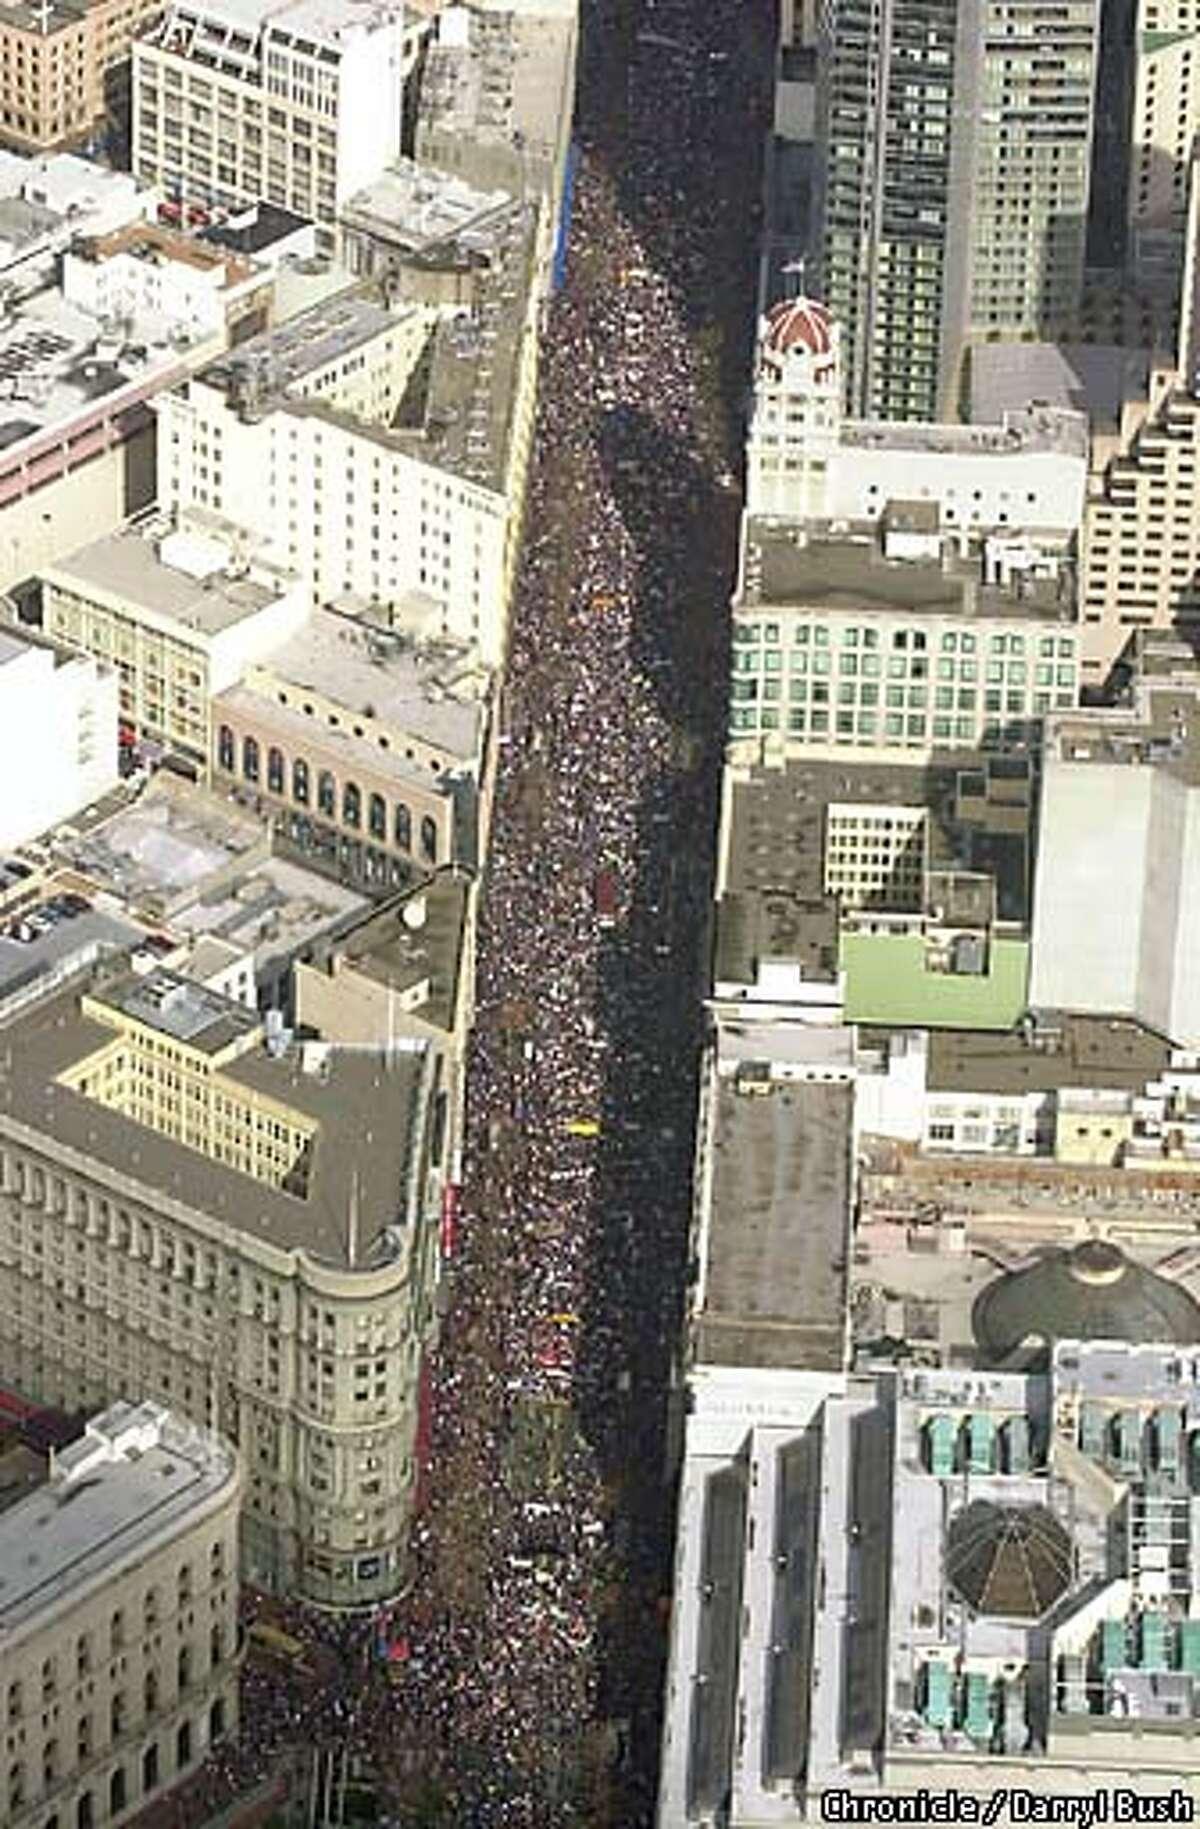 Peace marchers on Market Street in San Francisco Chronicle Photo by Darryl Bush